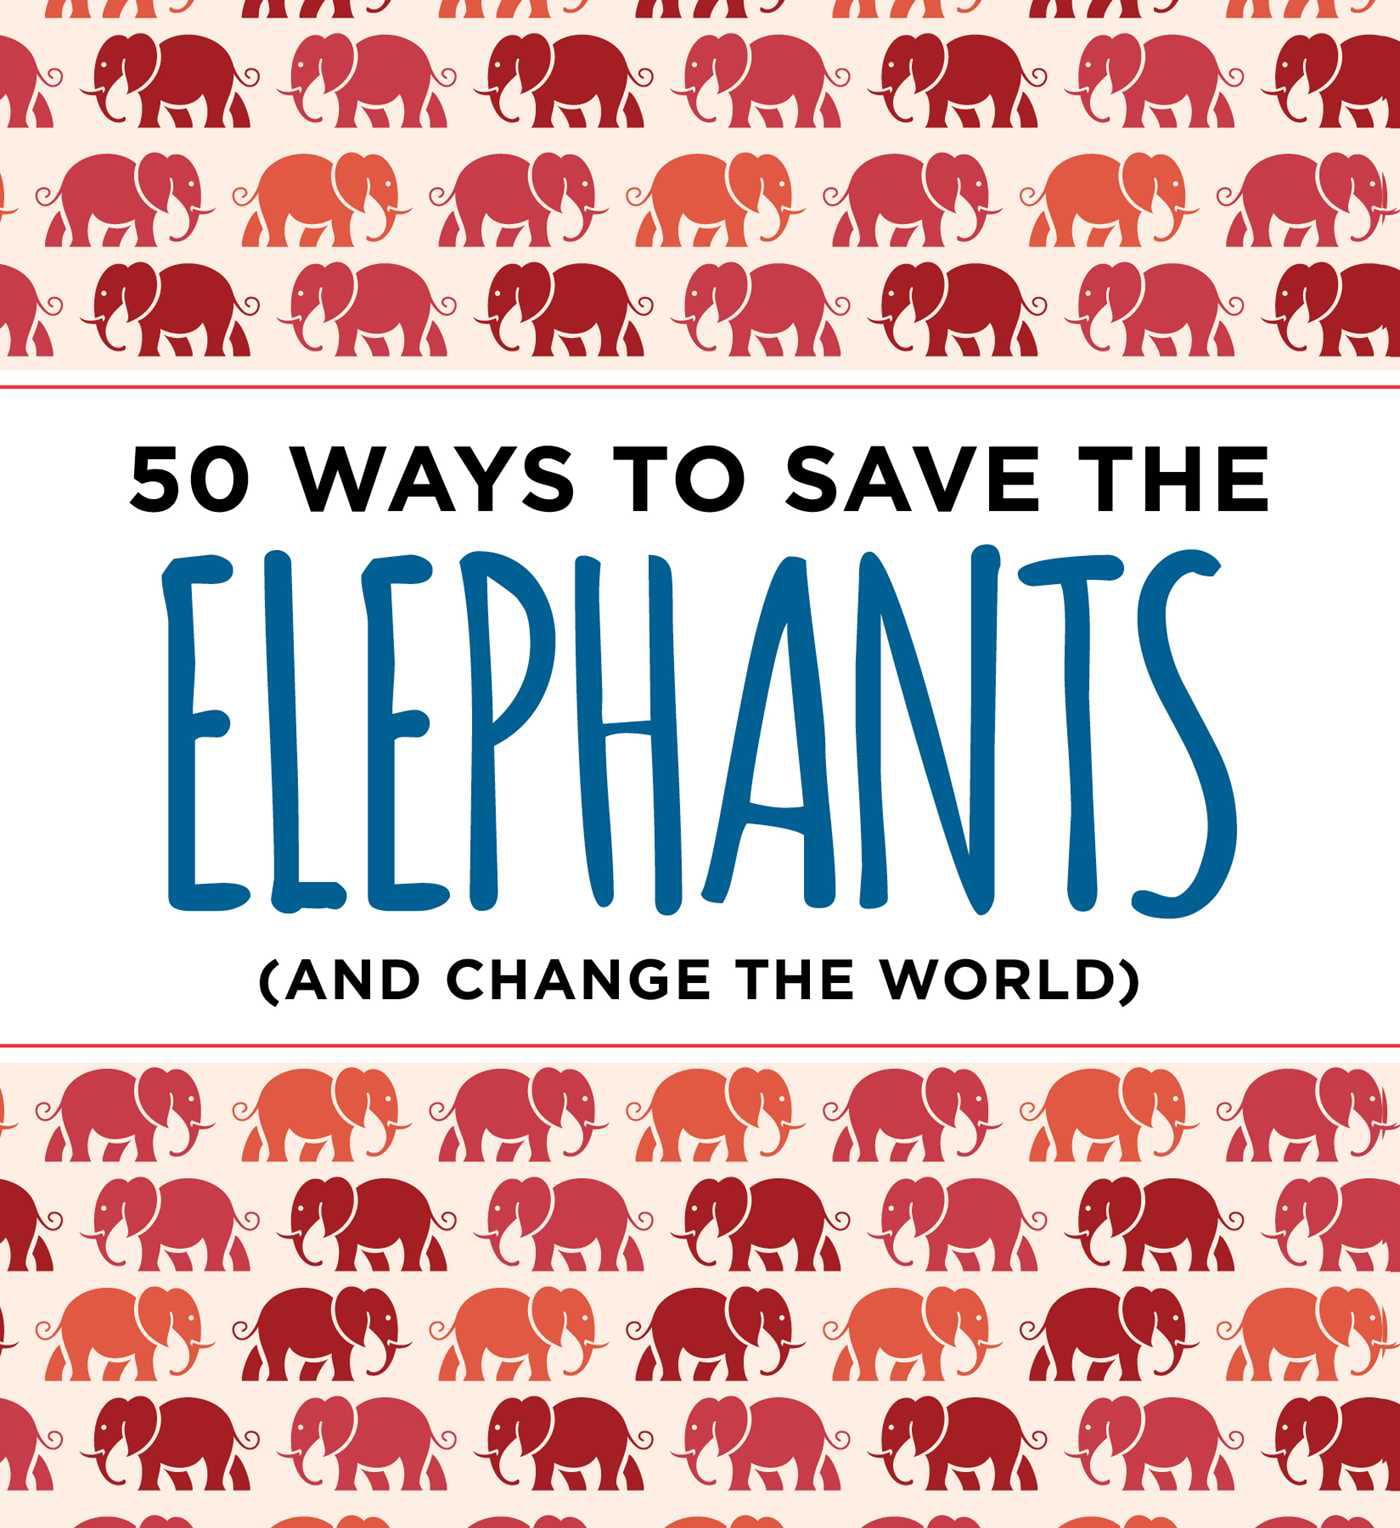 50 Ways to Save the Elephants